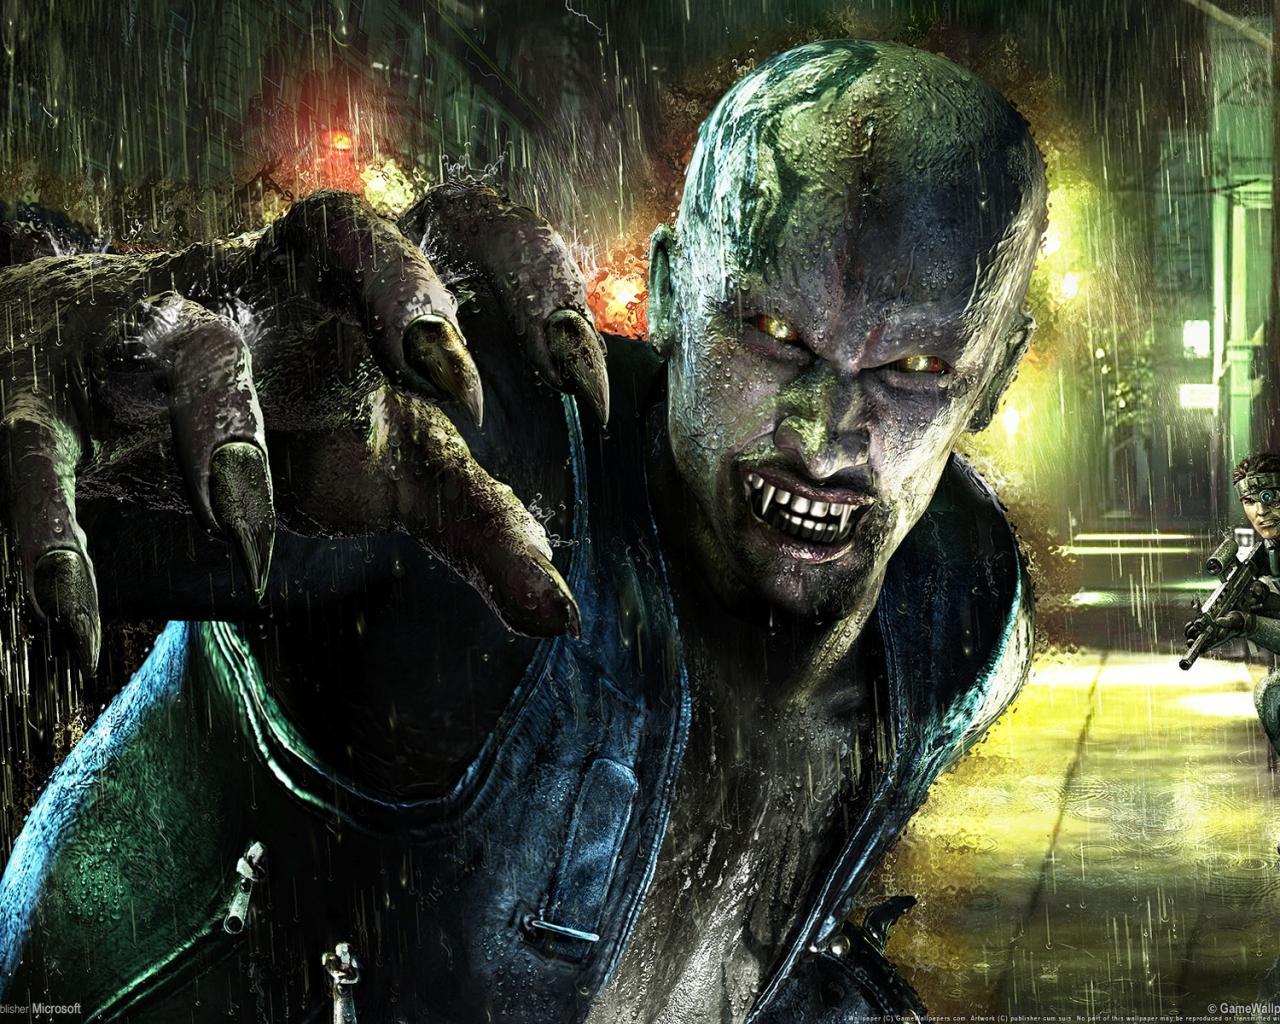 Обои игры игра Games Pubg Playerunknowns картинки на: Vampire Rain, Game, Pc Games, игра, видео игры